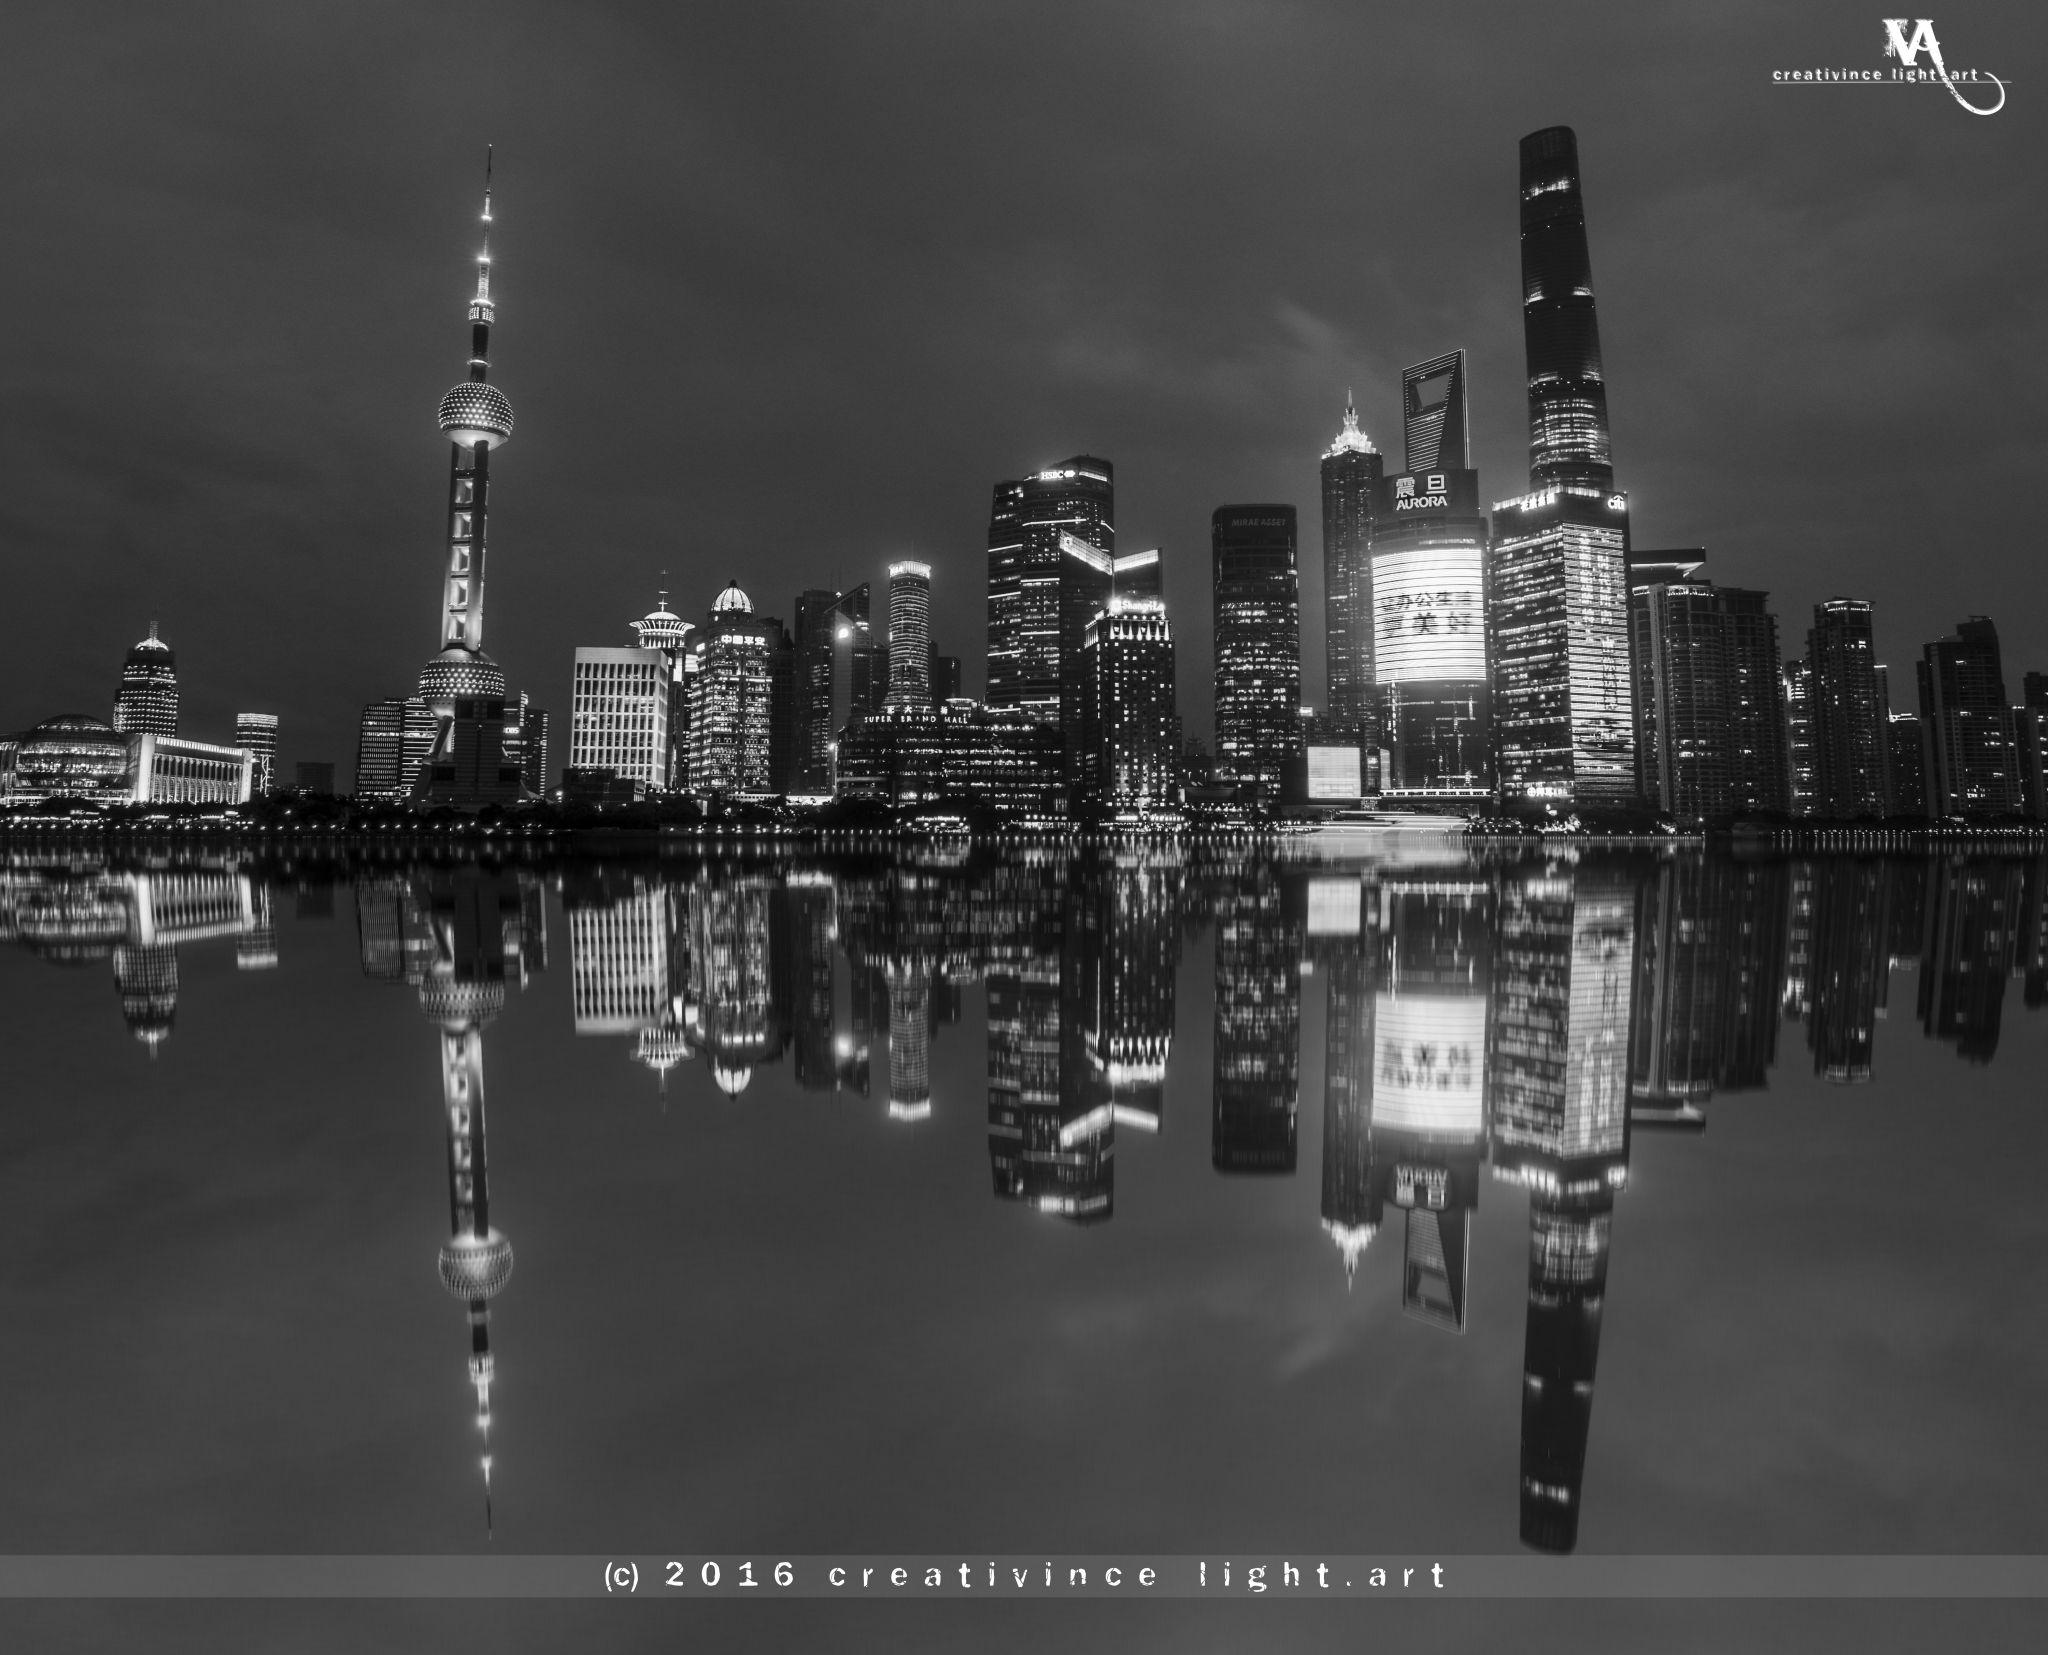 The Bund / Waitan, China